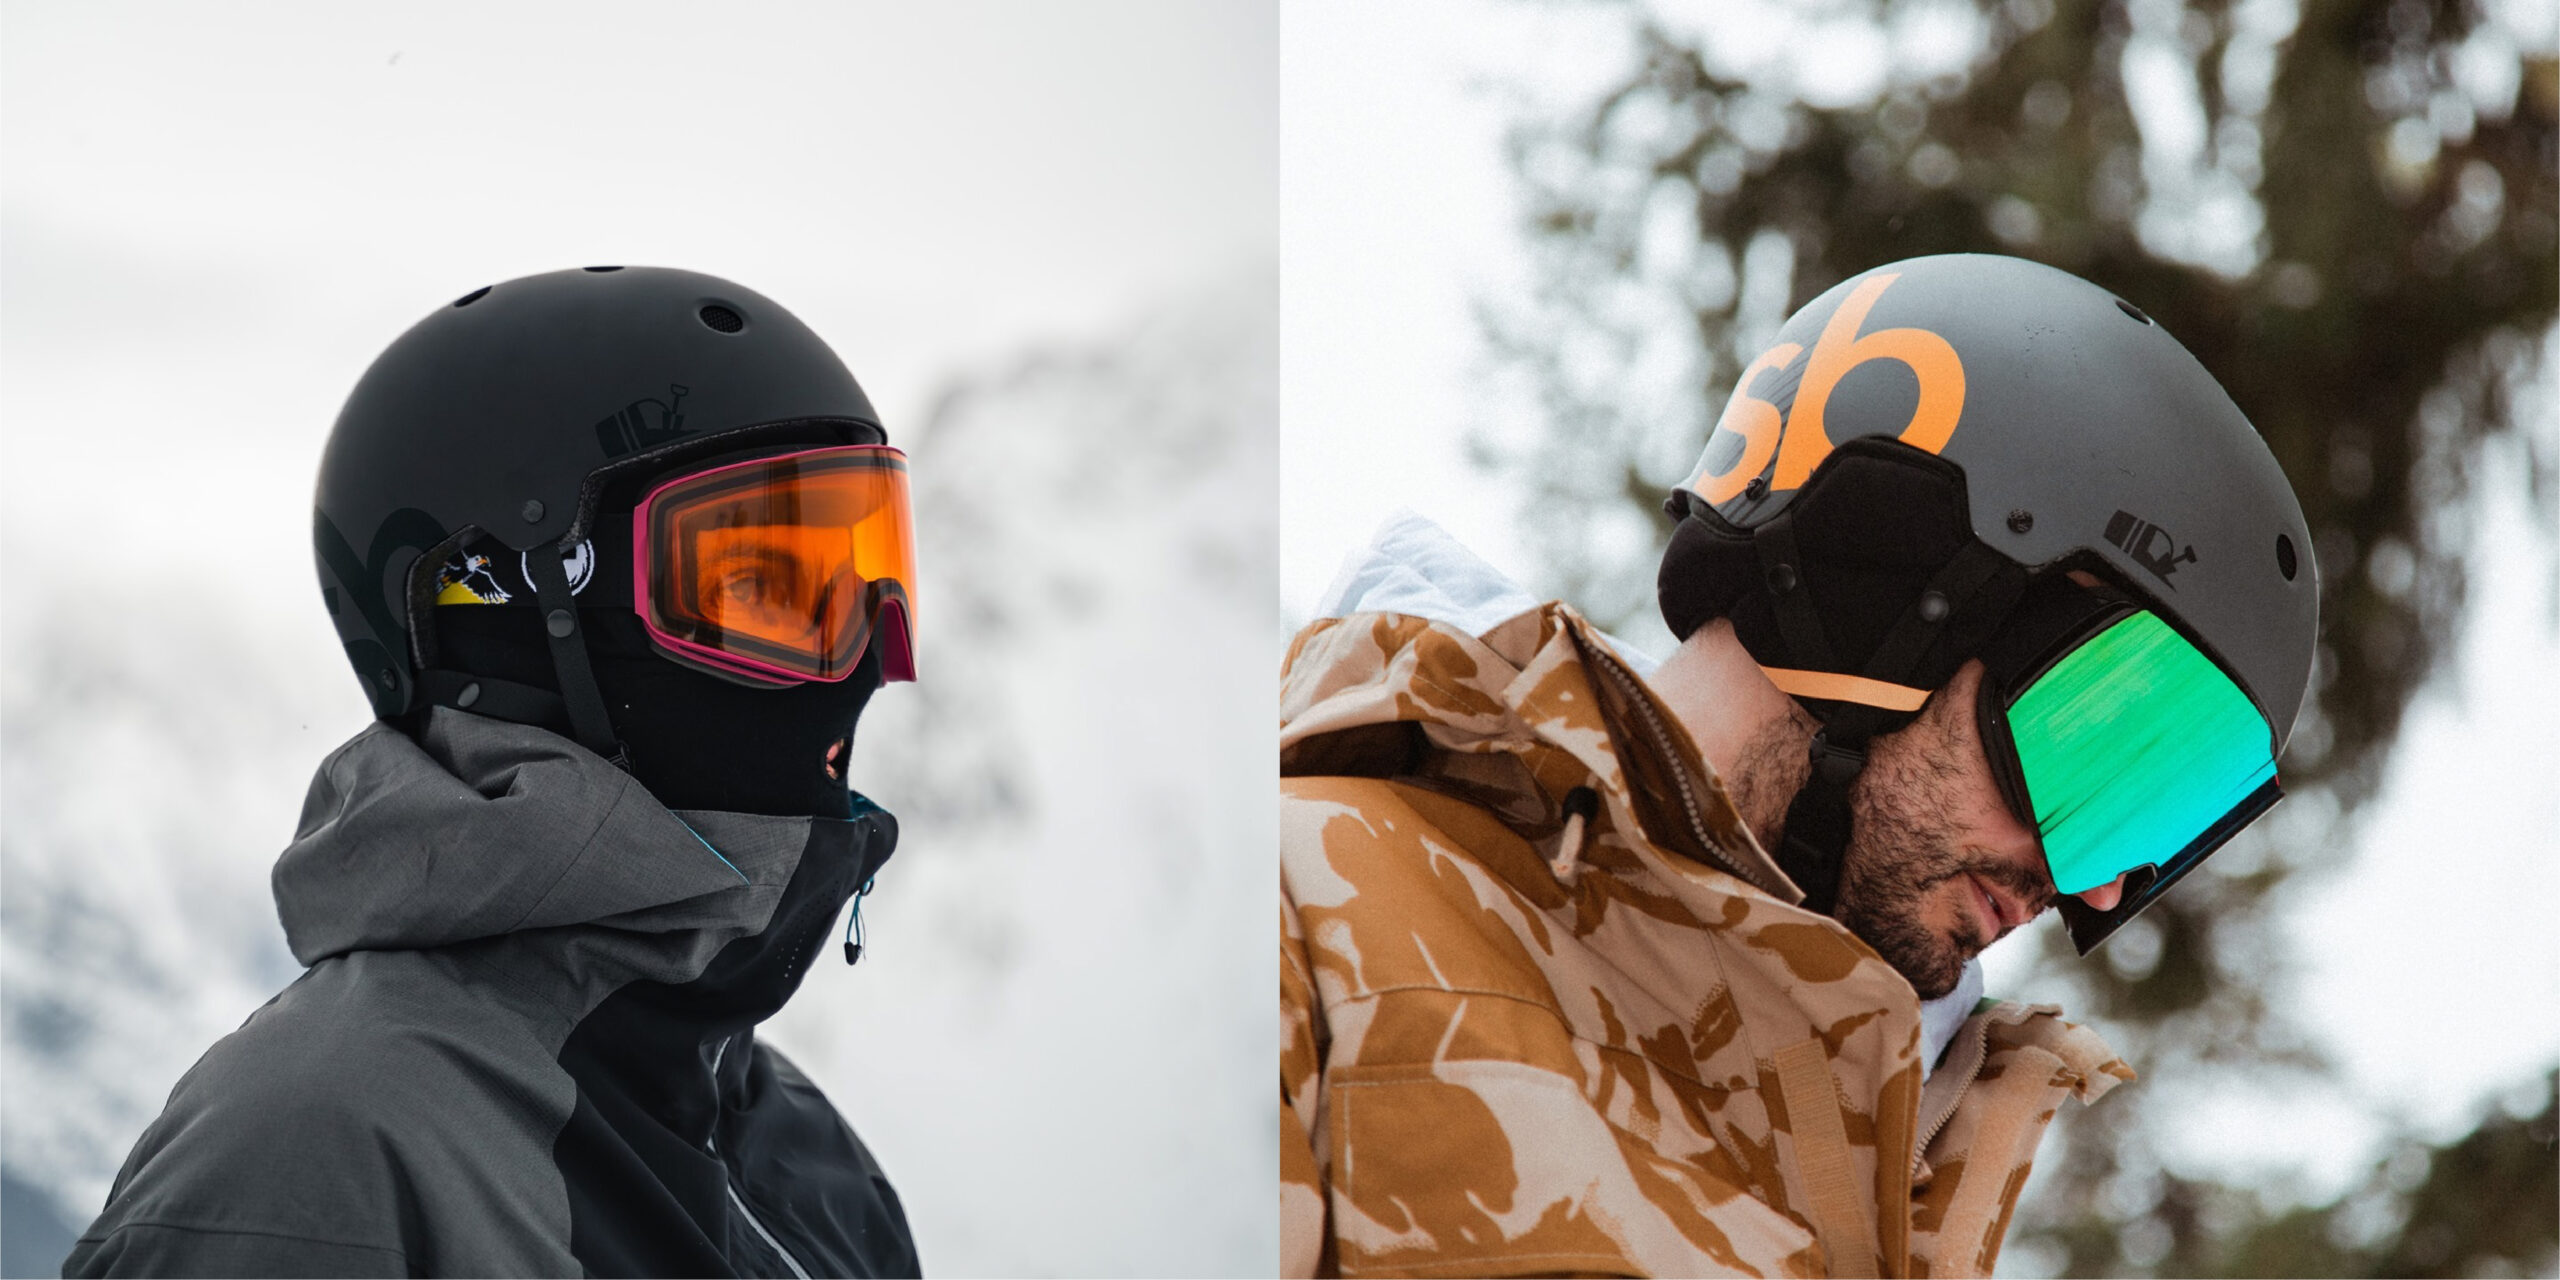 SANDBOX SKI/SNOWBOARD HELMET REVIEW